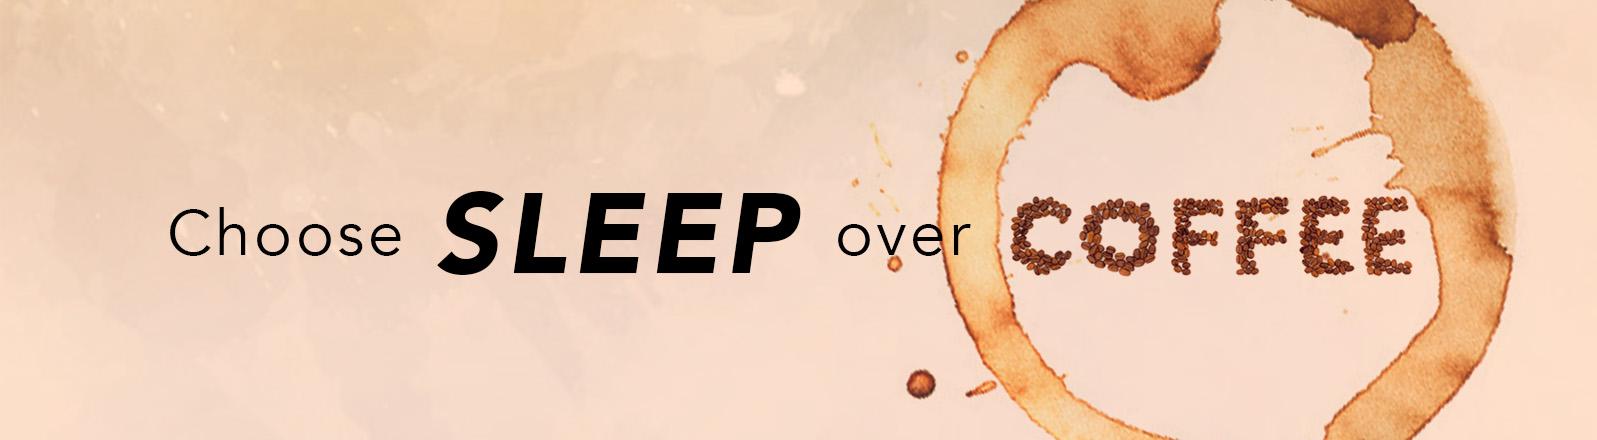 Choose Sleep Over Coffee